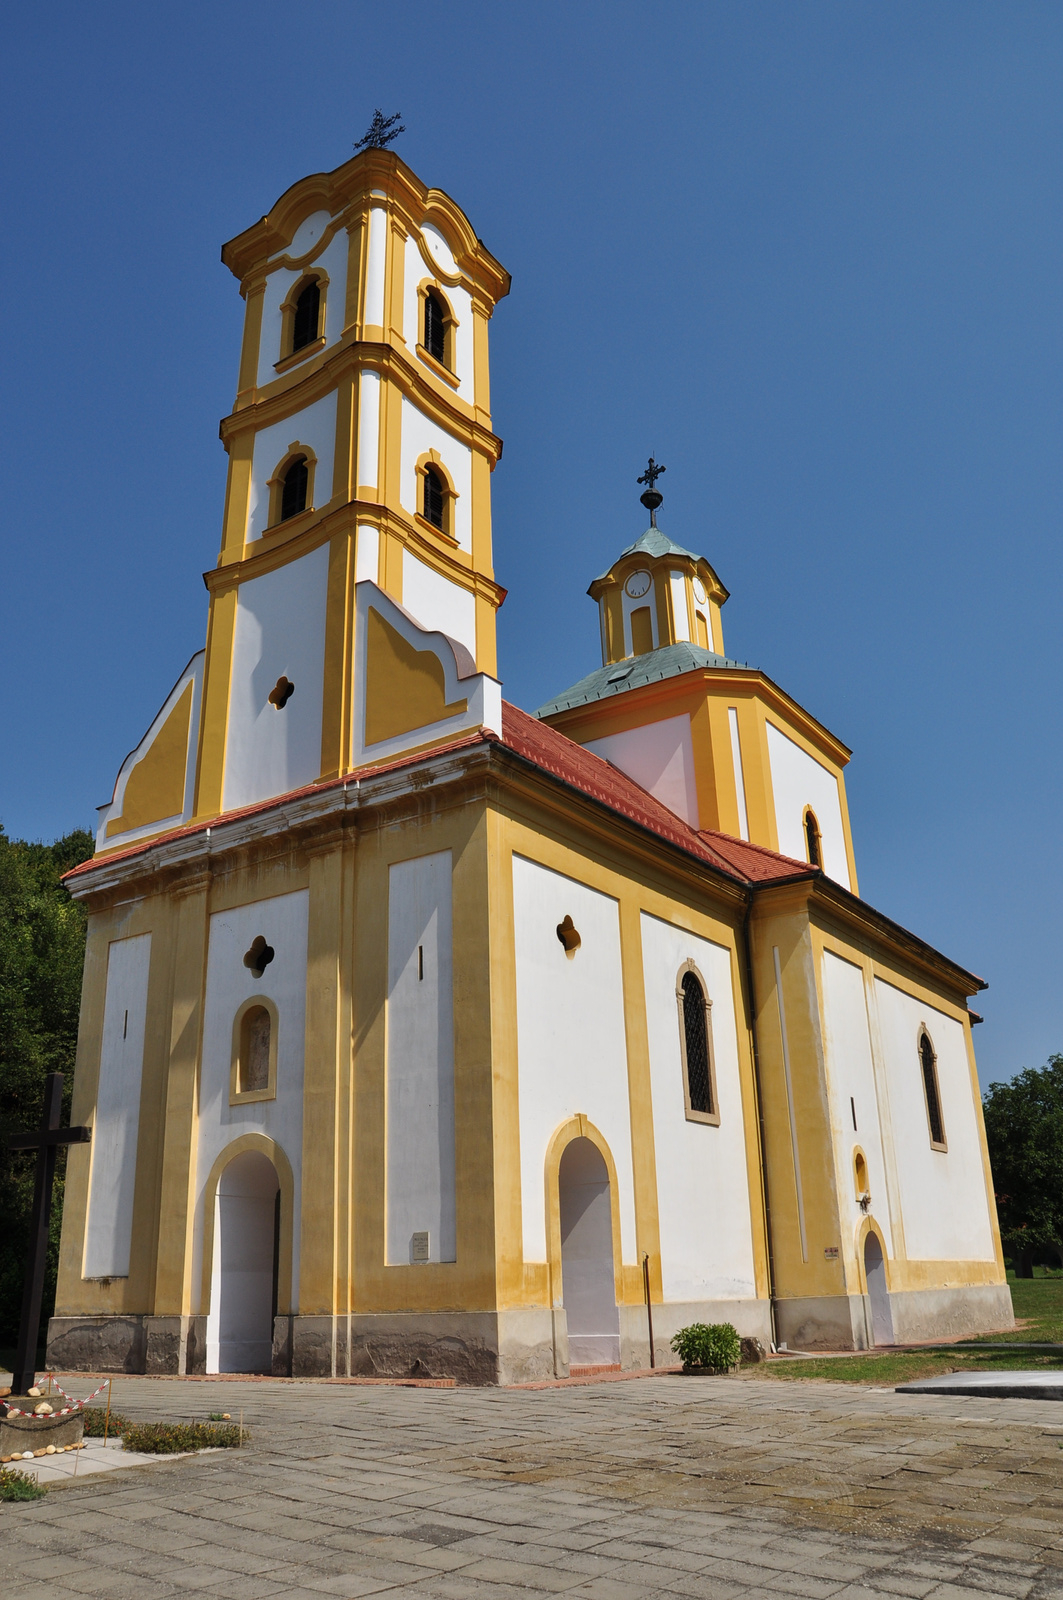 szerb ortodox kolostor s templom gr b c wikip dia. Black Bedroom Furniture Sets. Home Design Ideas